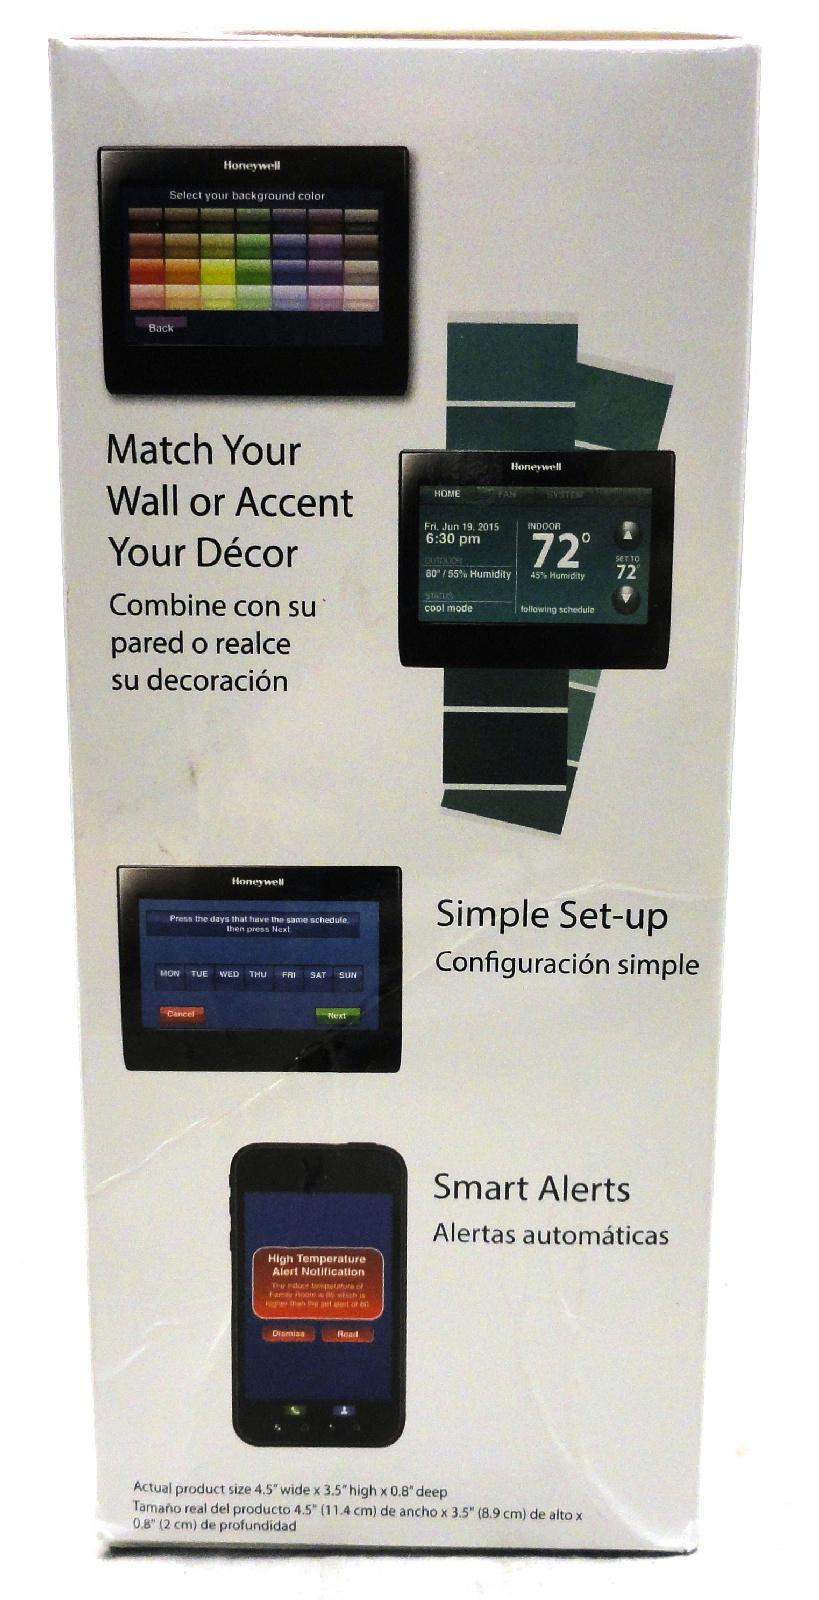 honeywell rth9590wf wi fi smart thermostat wtih voice control ebay. Black Bedroom Furniture Sets. Home Design Ideas